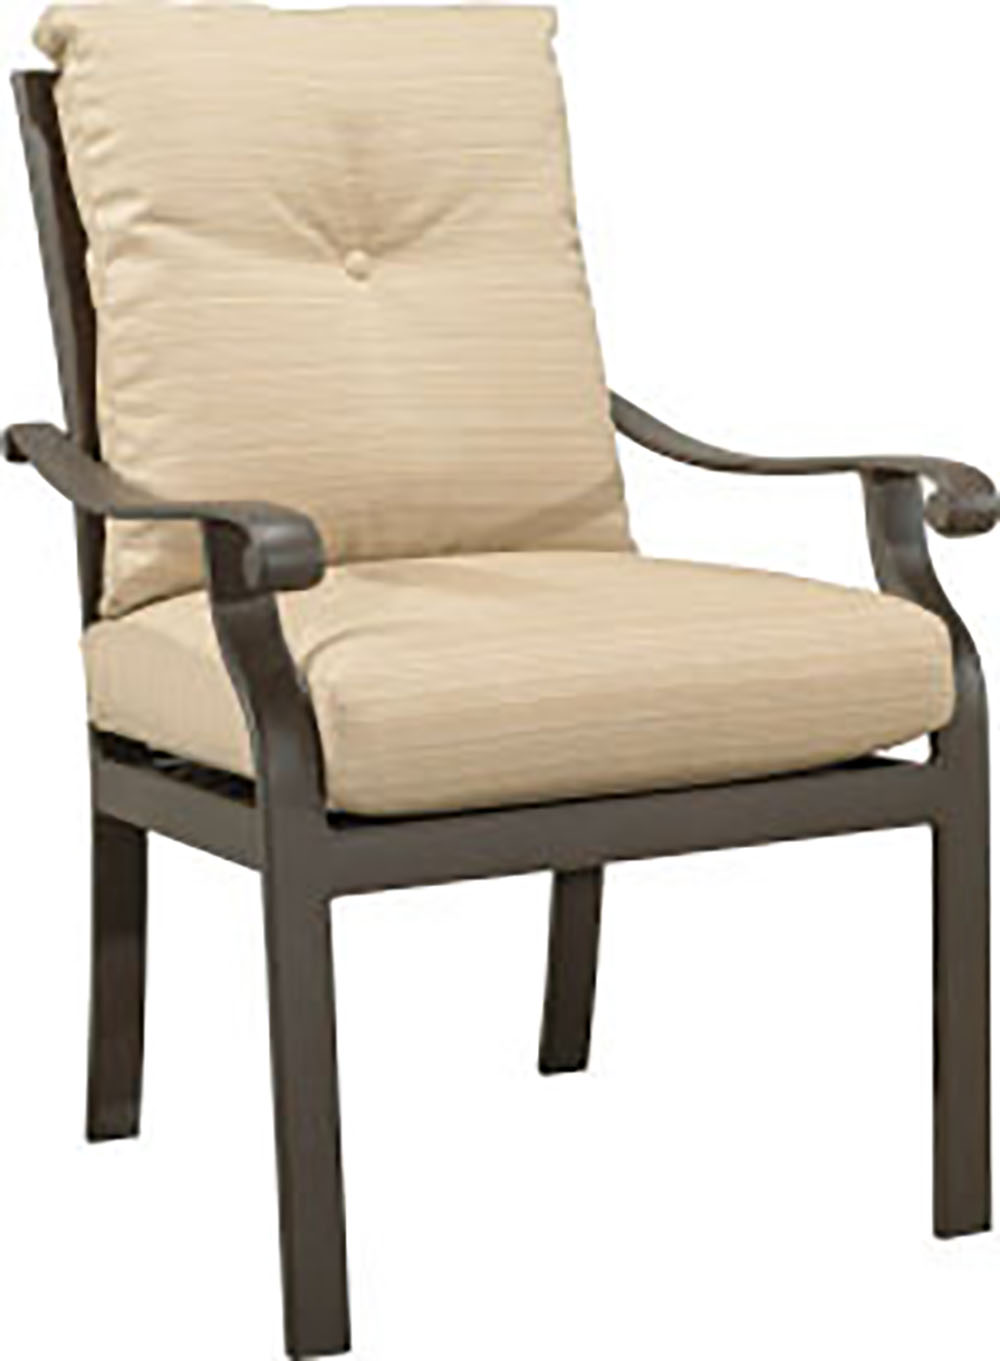 "970520 Mandalay Dining Chair   27"" x 30"" x 37"""